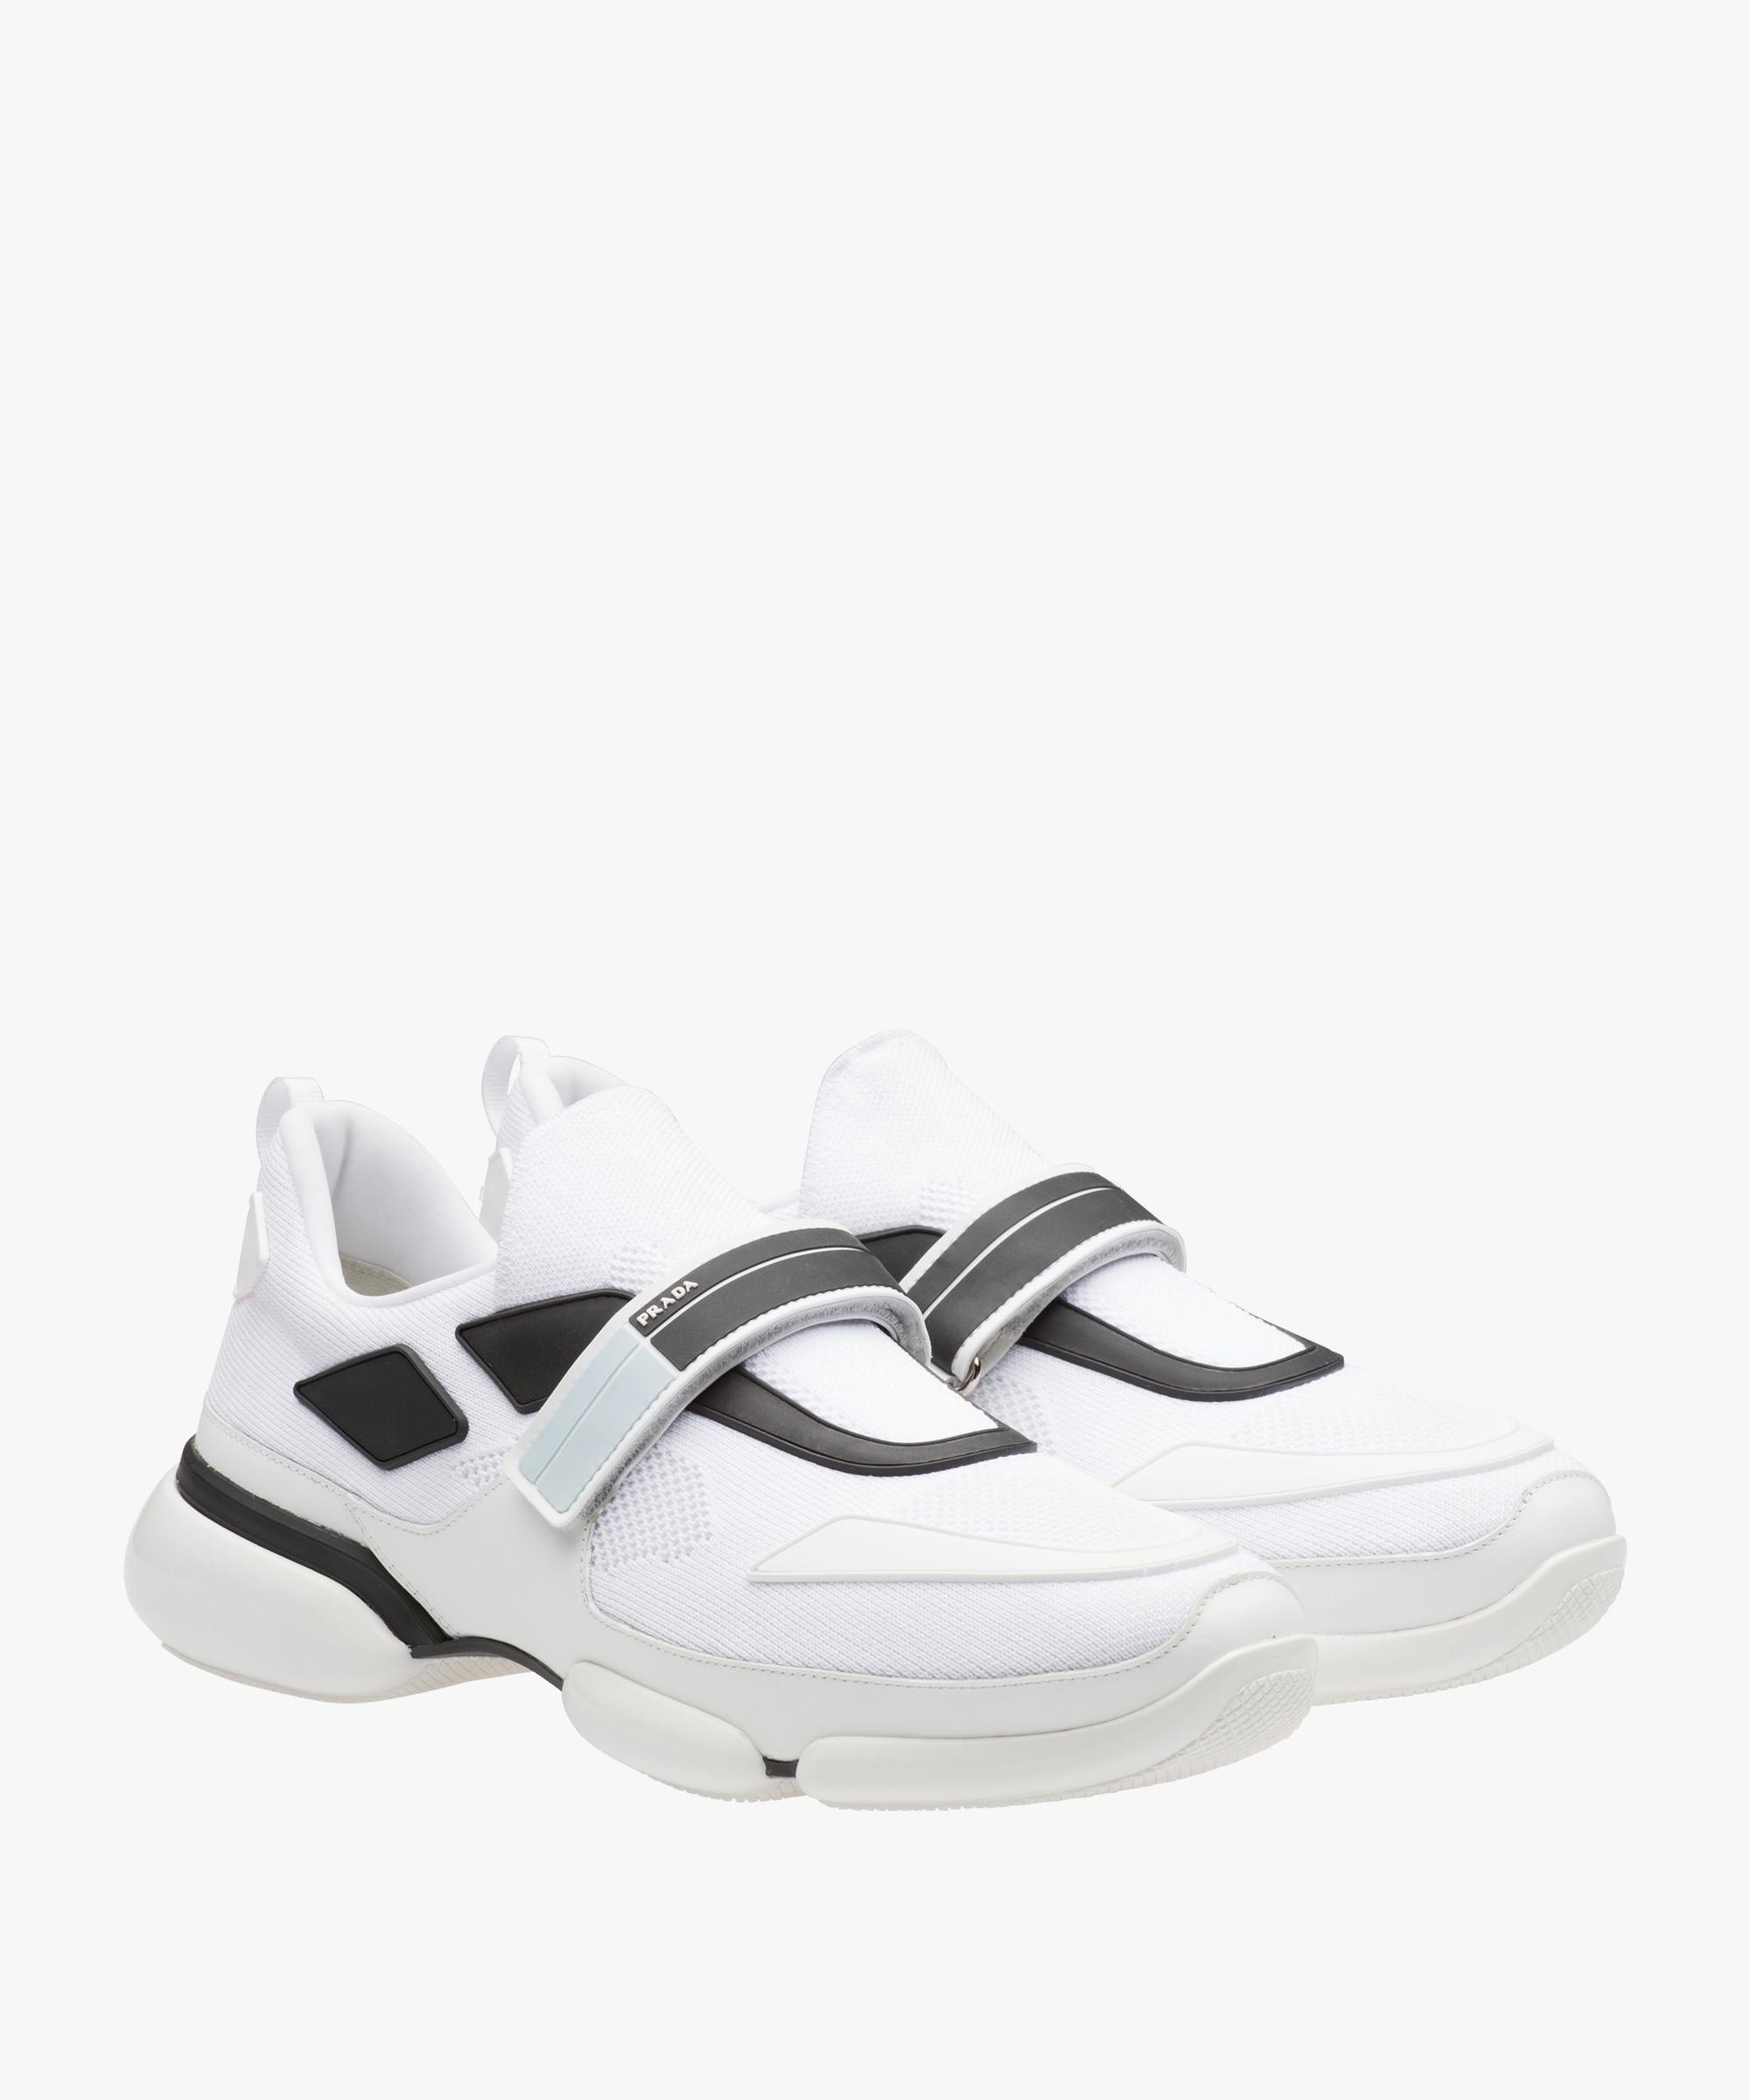 Sneaker Cloudbust Blanc Prada vIbIQnD